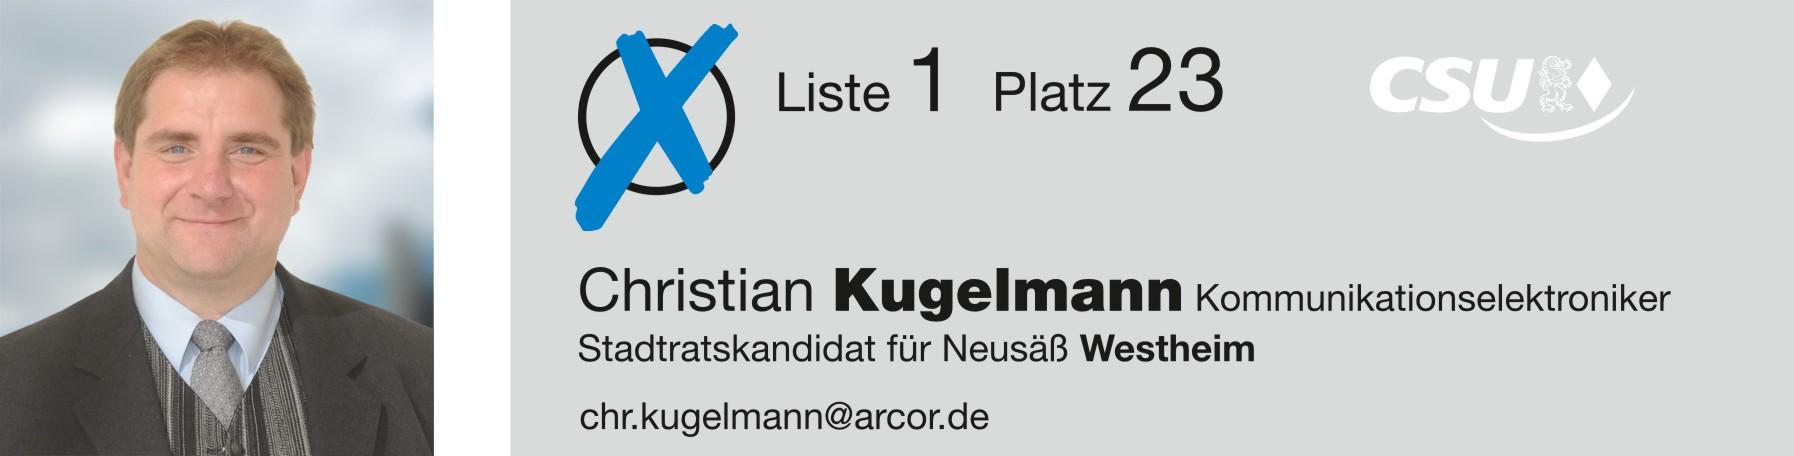 Christian Kugelmann